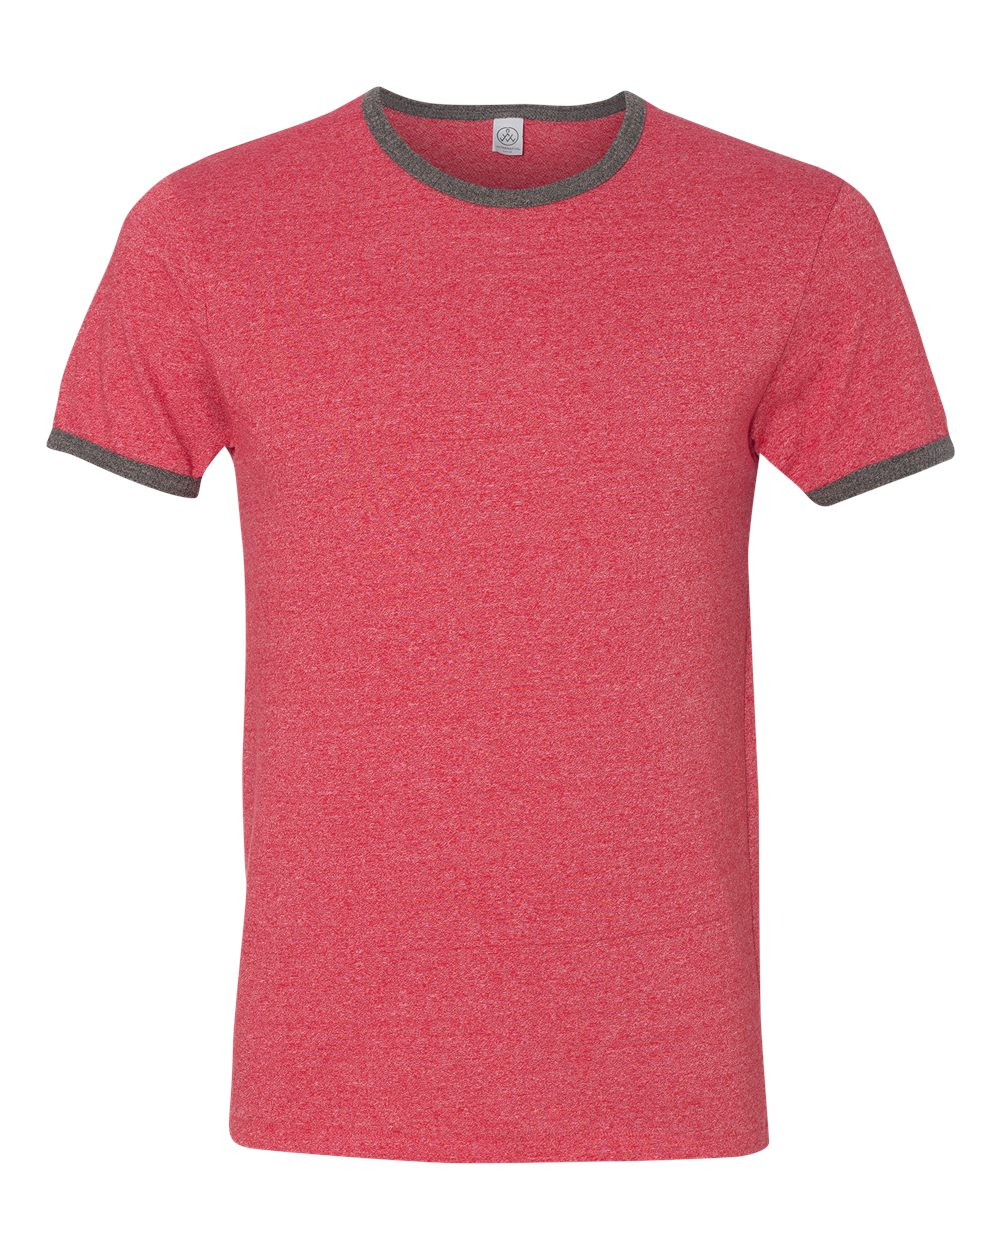 Custom ringer t shirt kirkwood trading company for Custom t shirts under 10